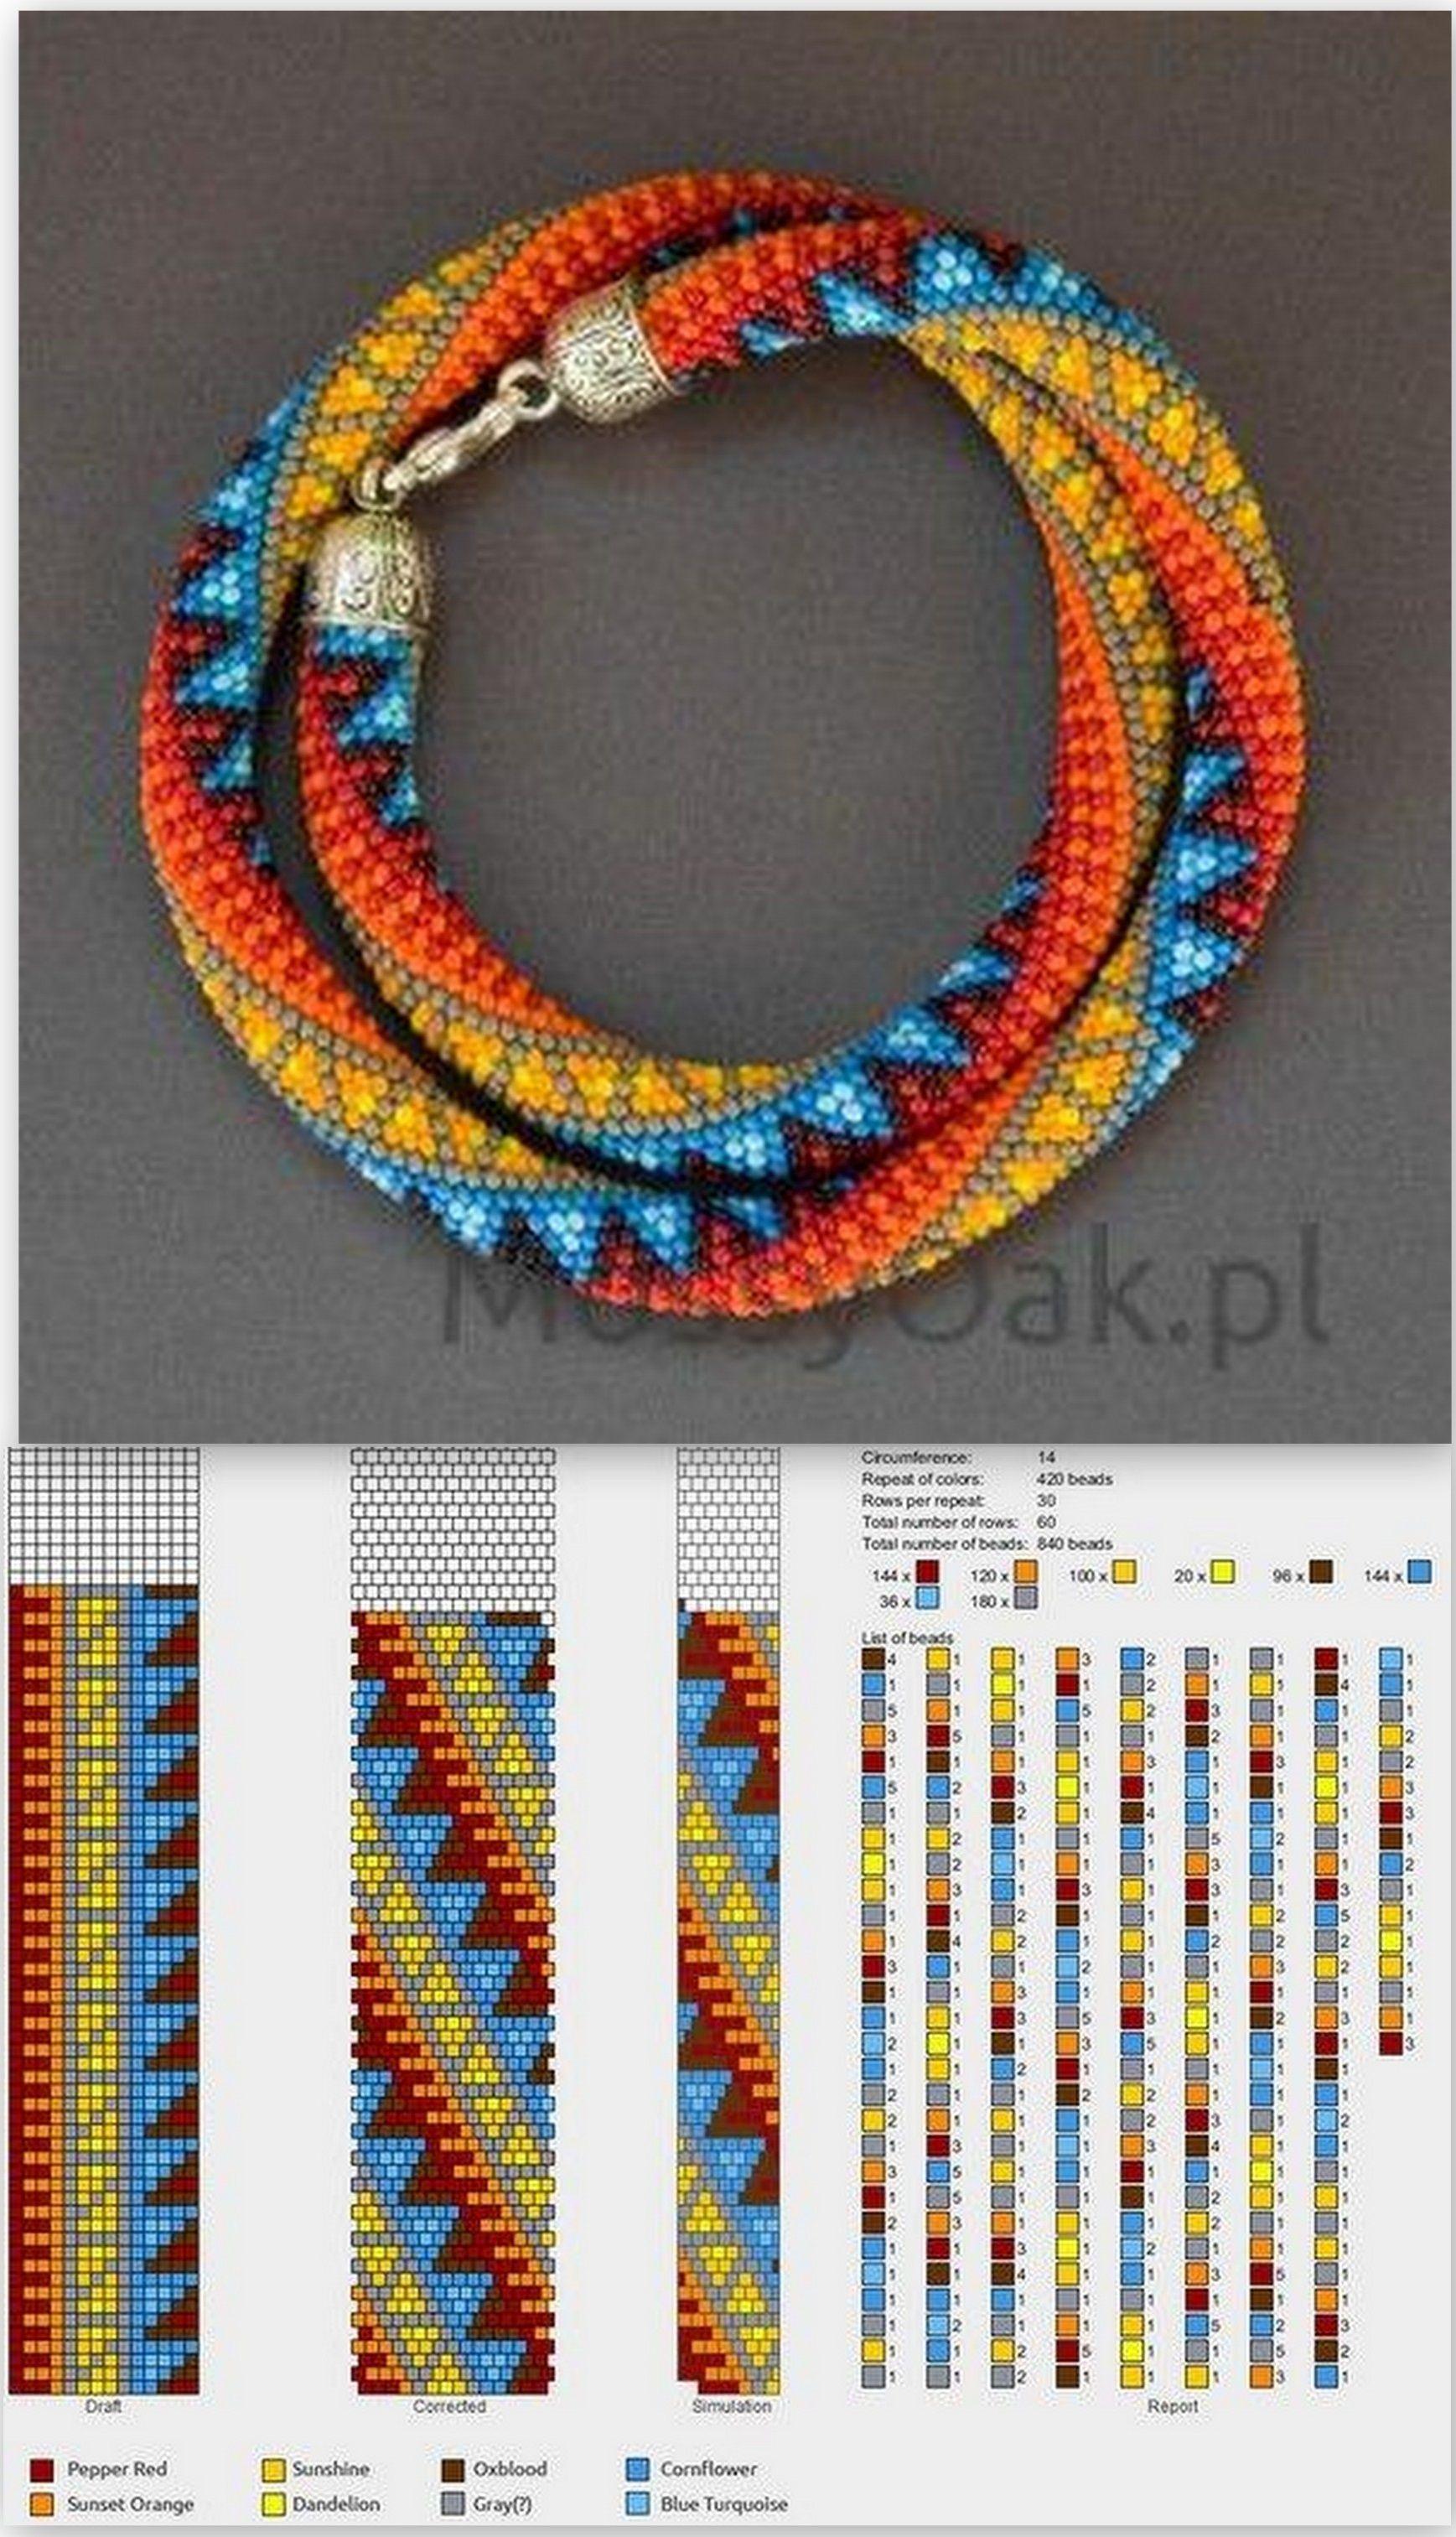 Pin By Daniel De Lang On Beads Häkeln Schmuck Häkeln Armband Häkeln